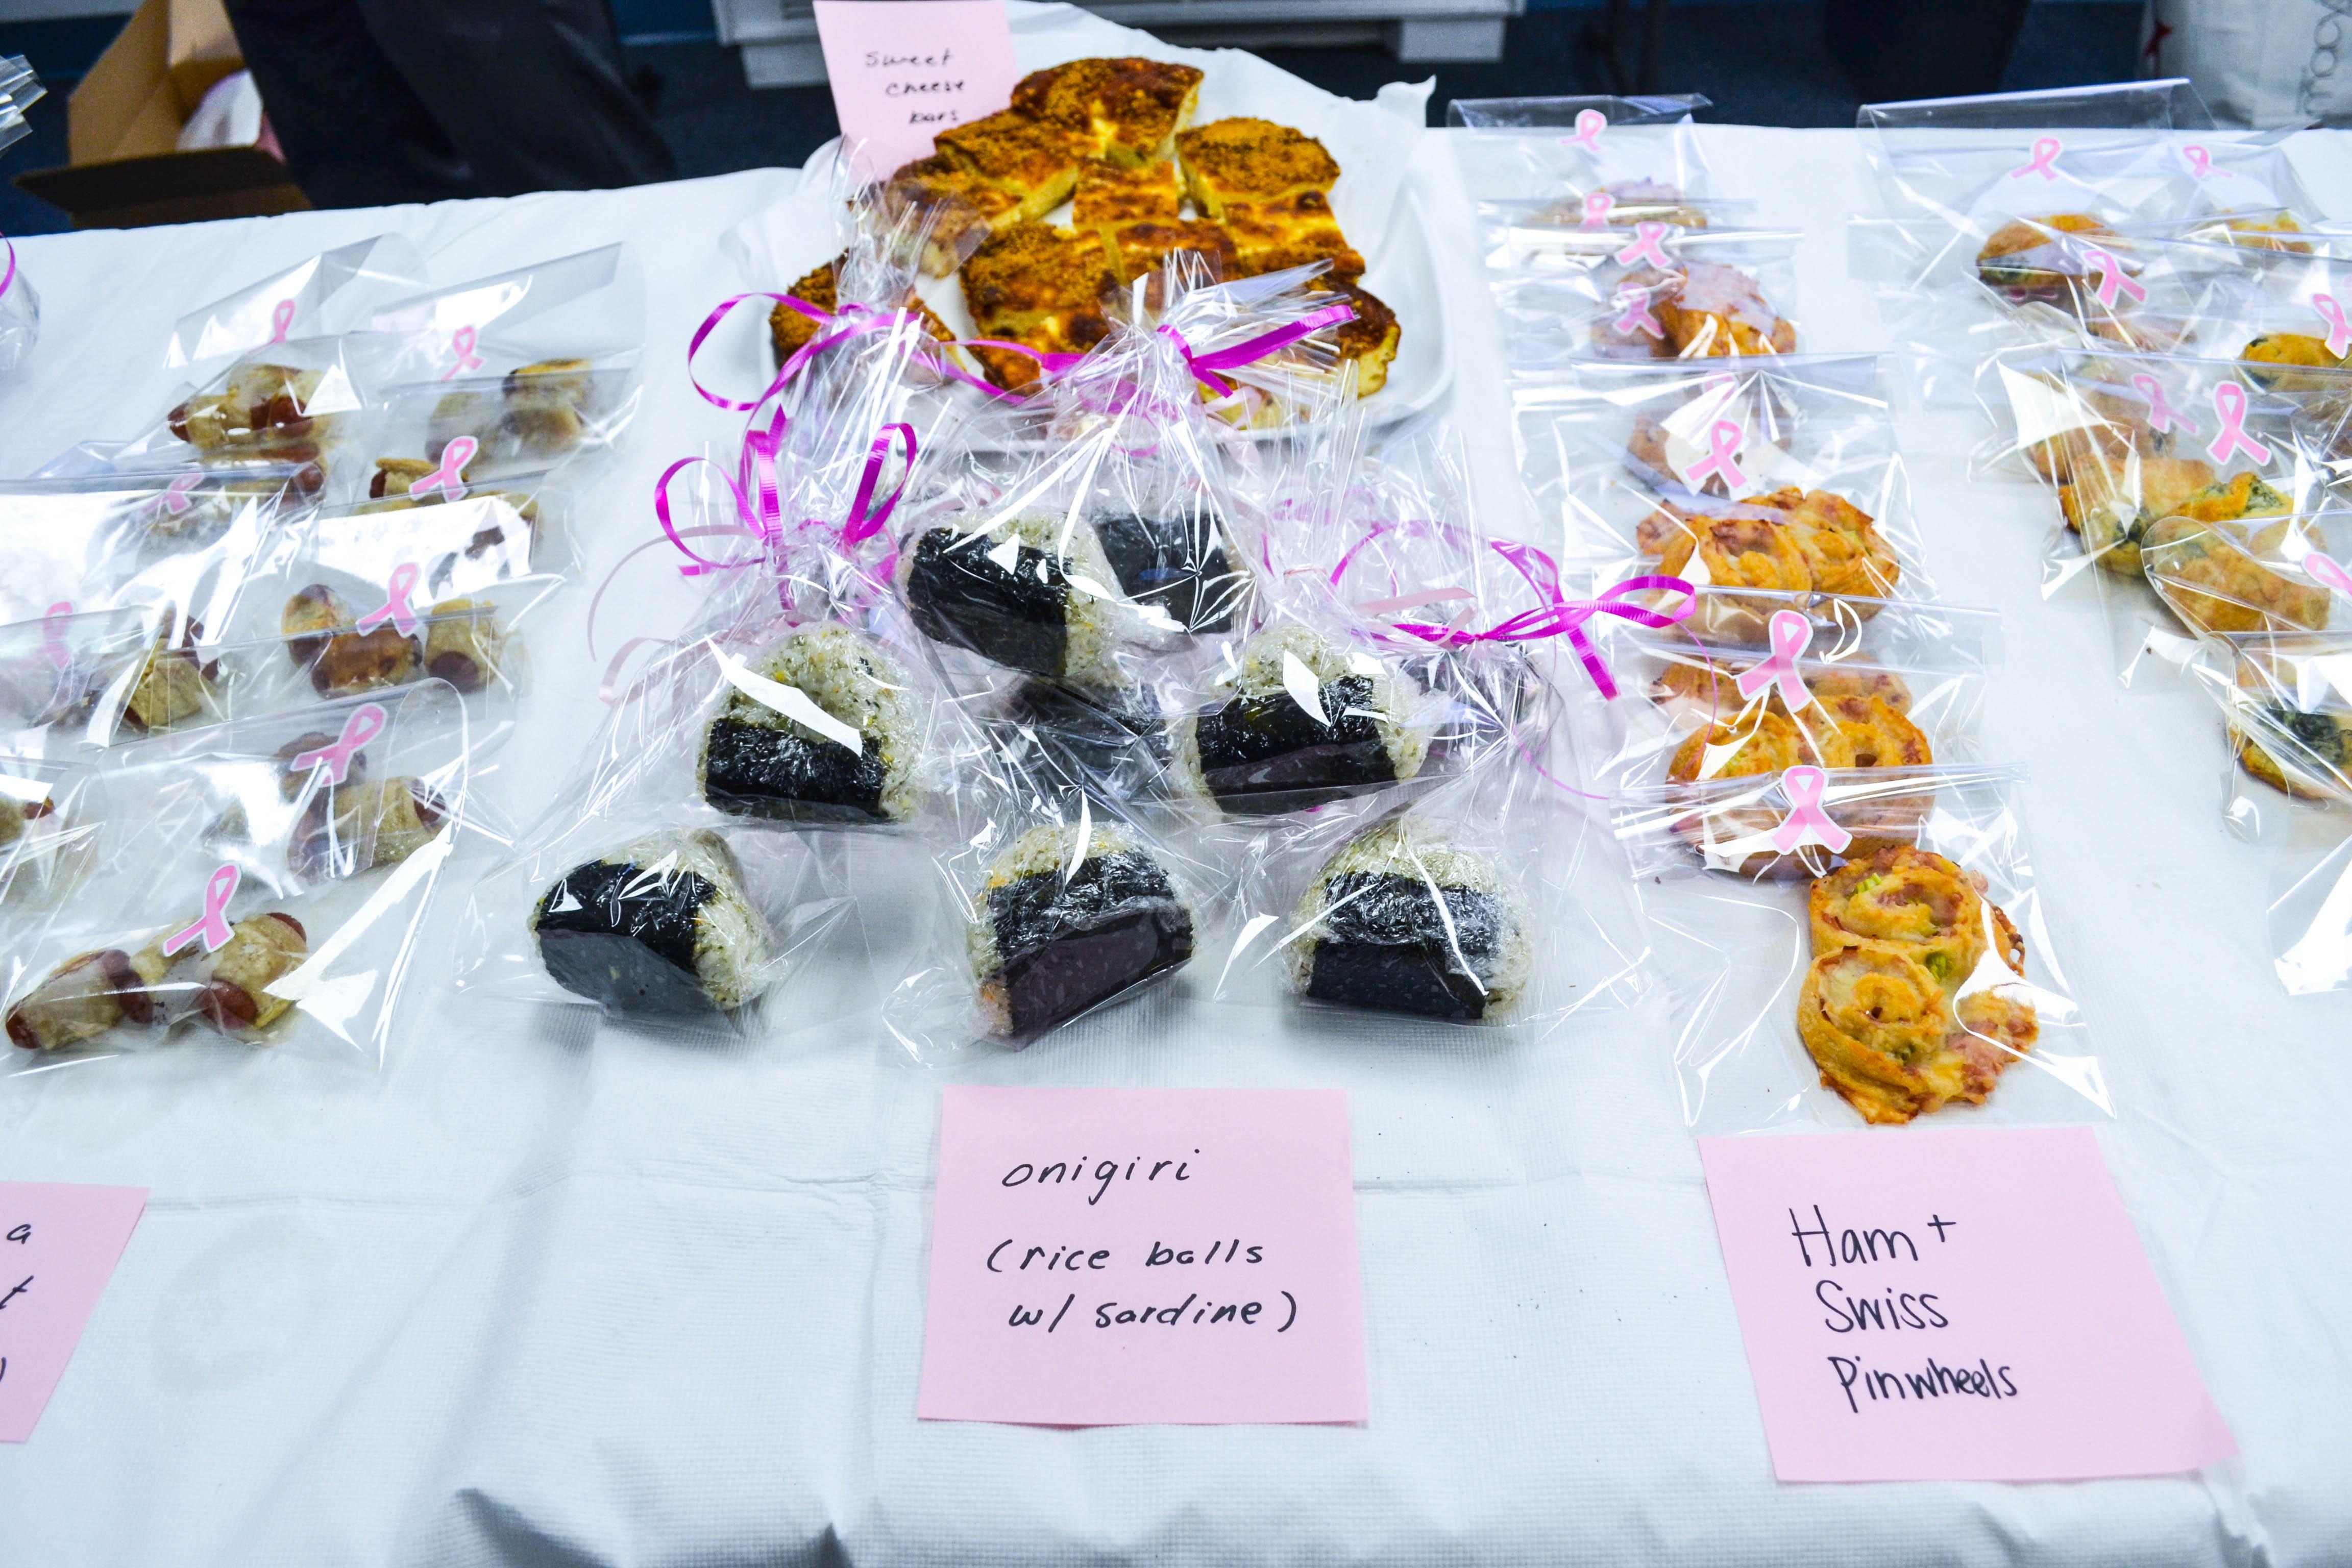 Onigiri and baked pinwheels sold at Diplomatic Language Services Susan G. Komen Bake Sale